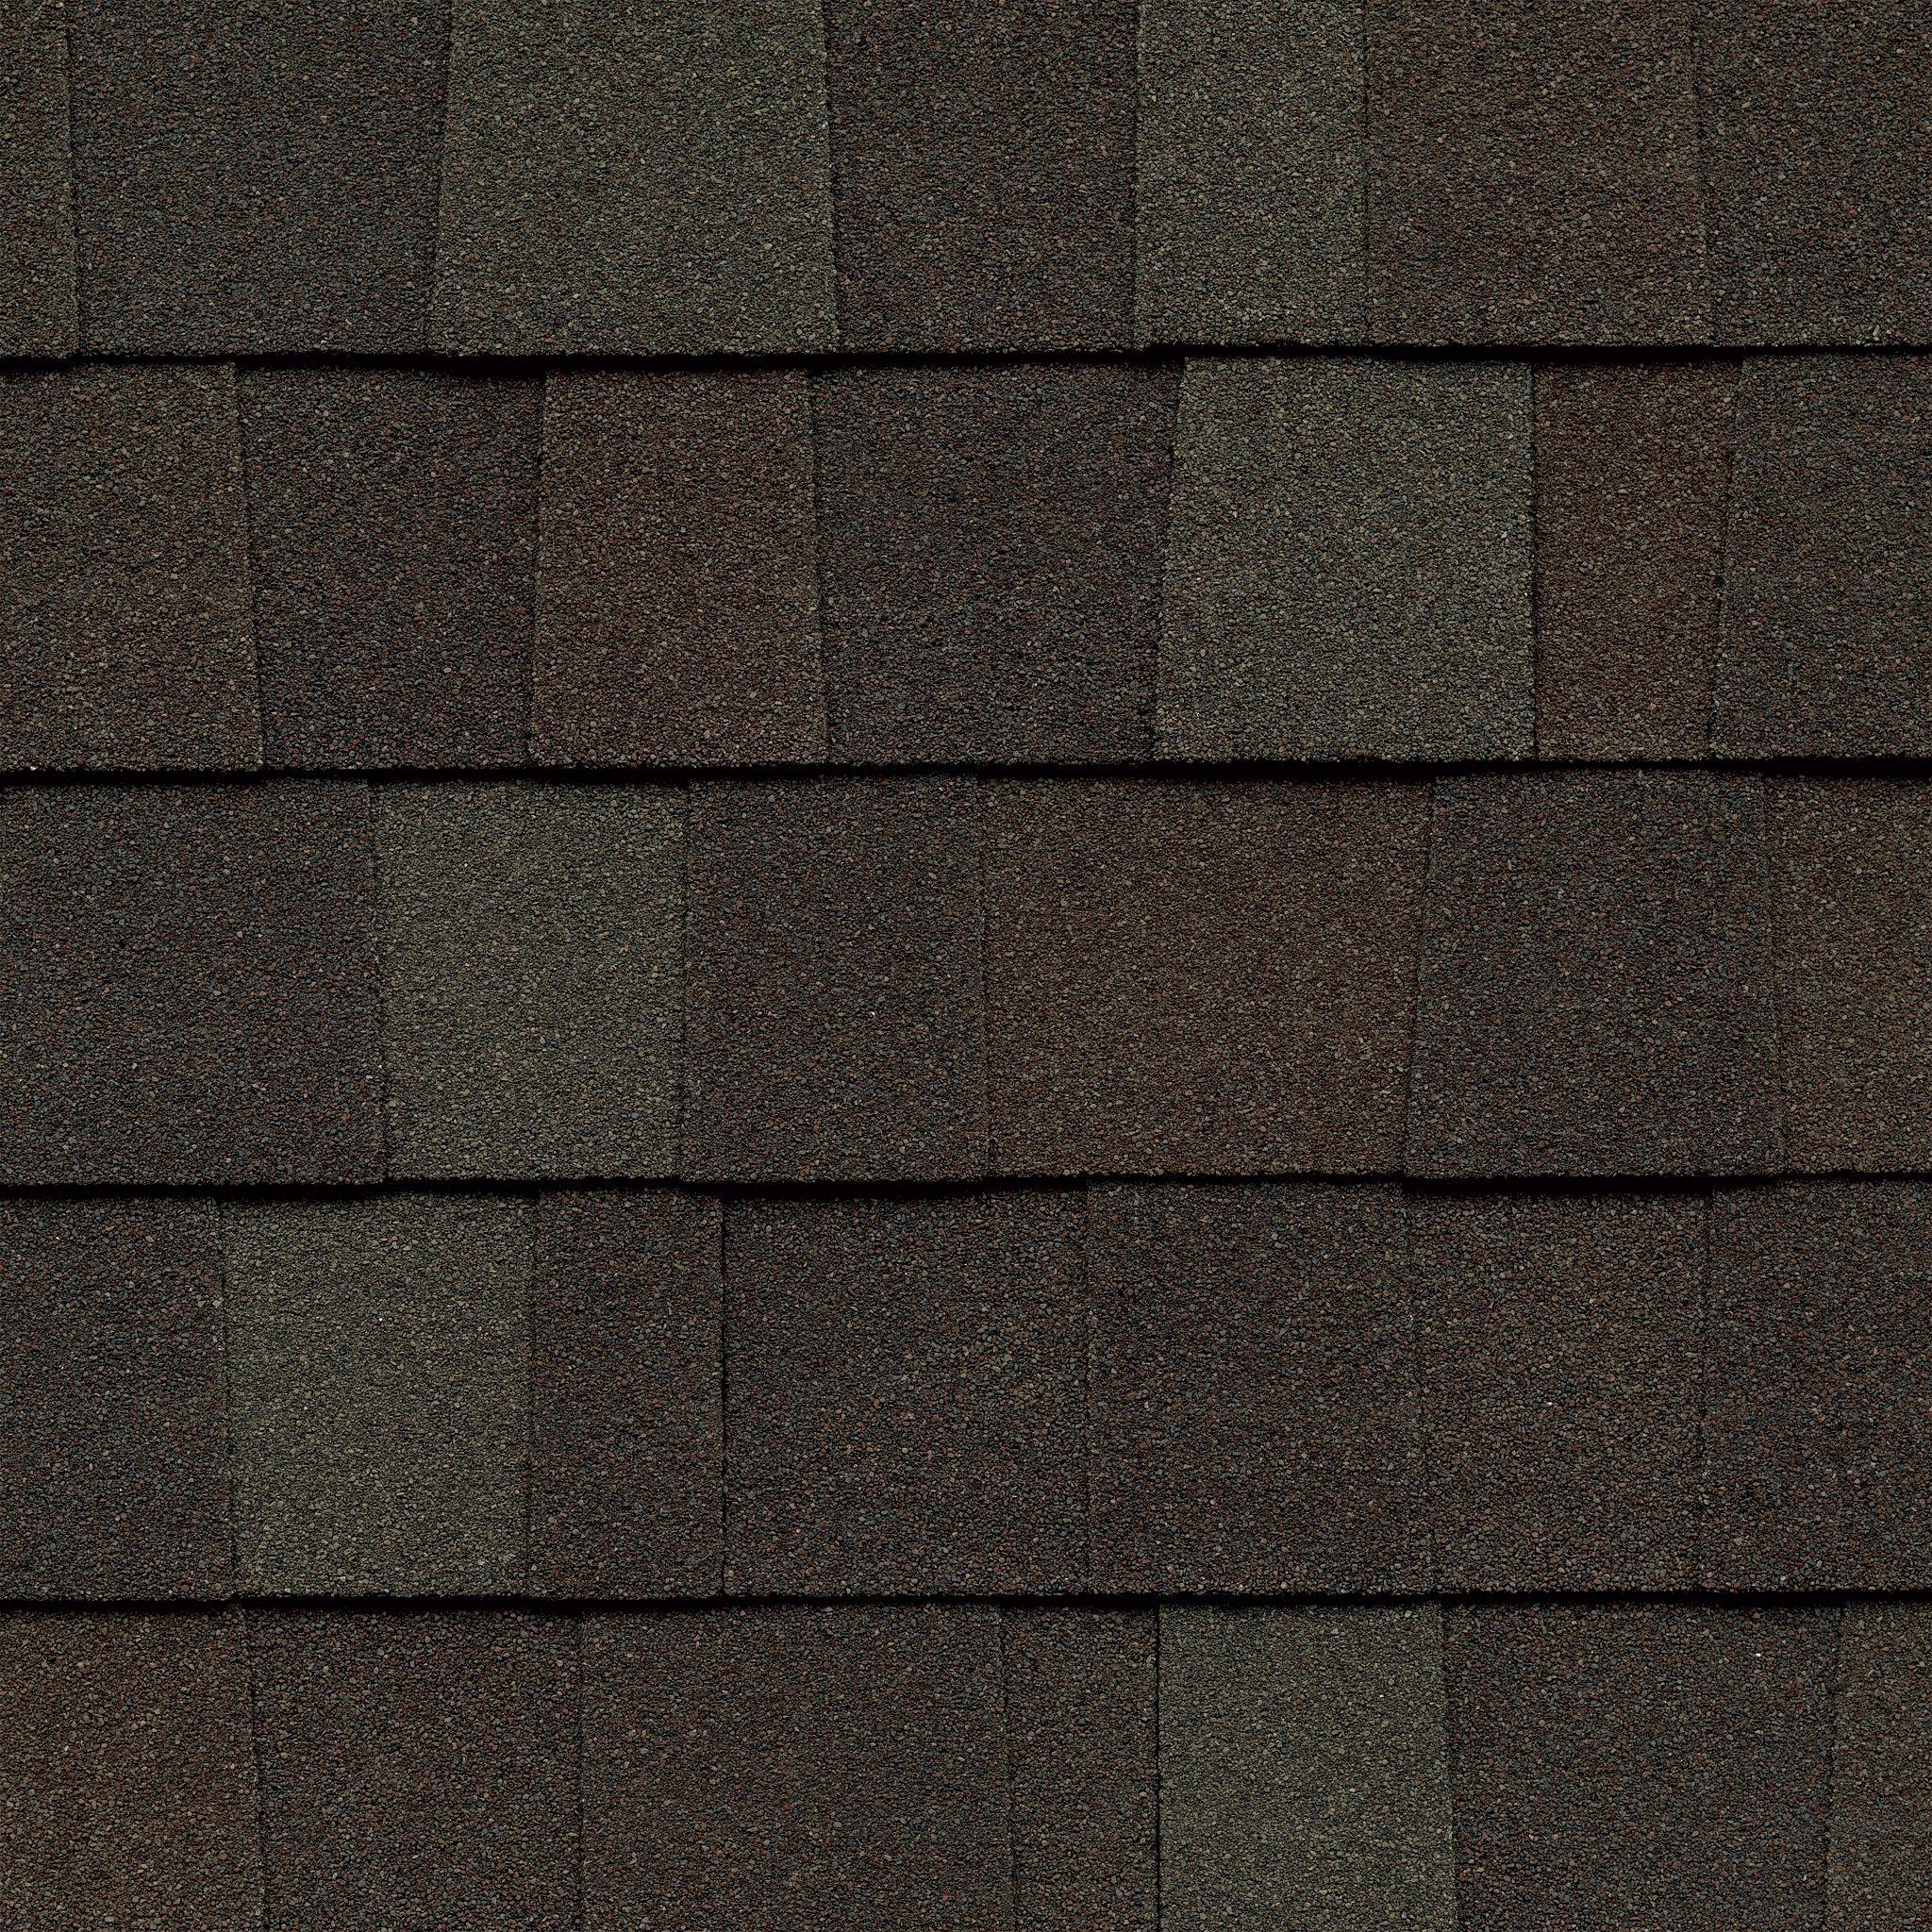 Gaf Timberline American Harvest Roofing Shingles Timberline Shingling Roofing